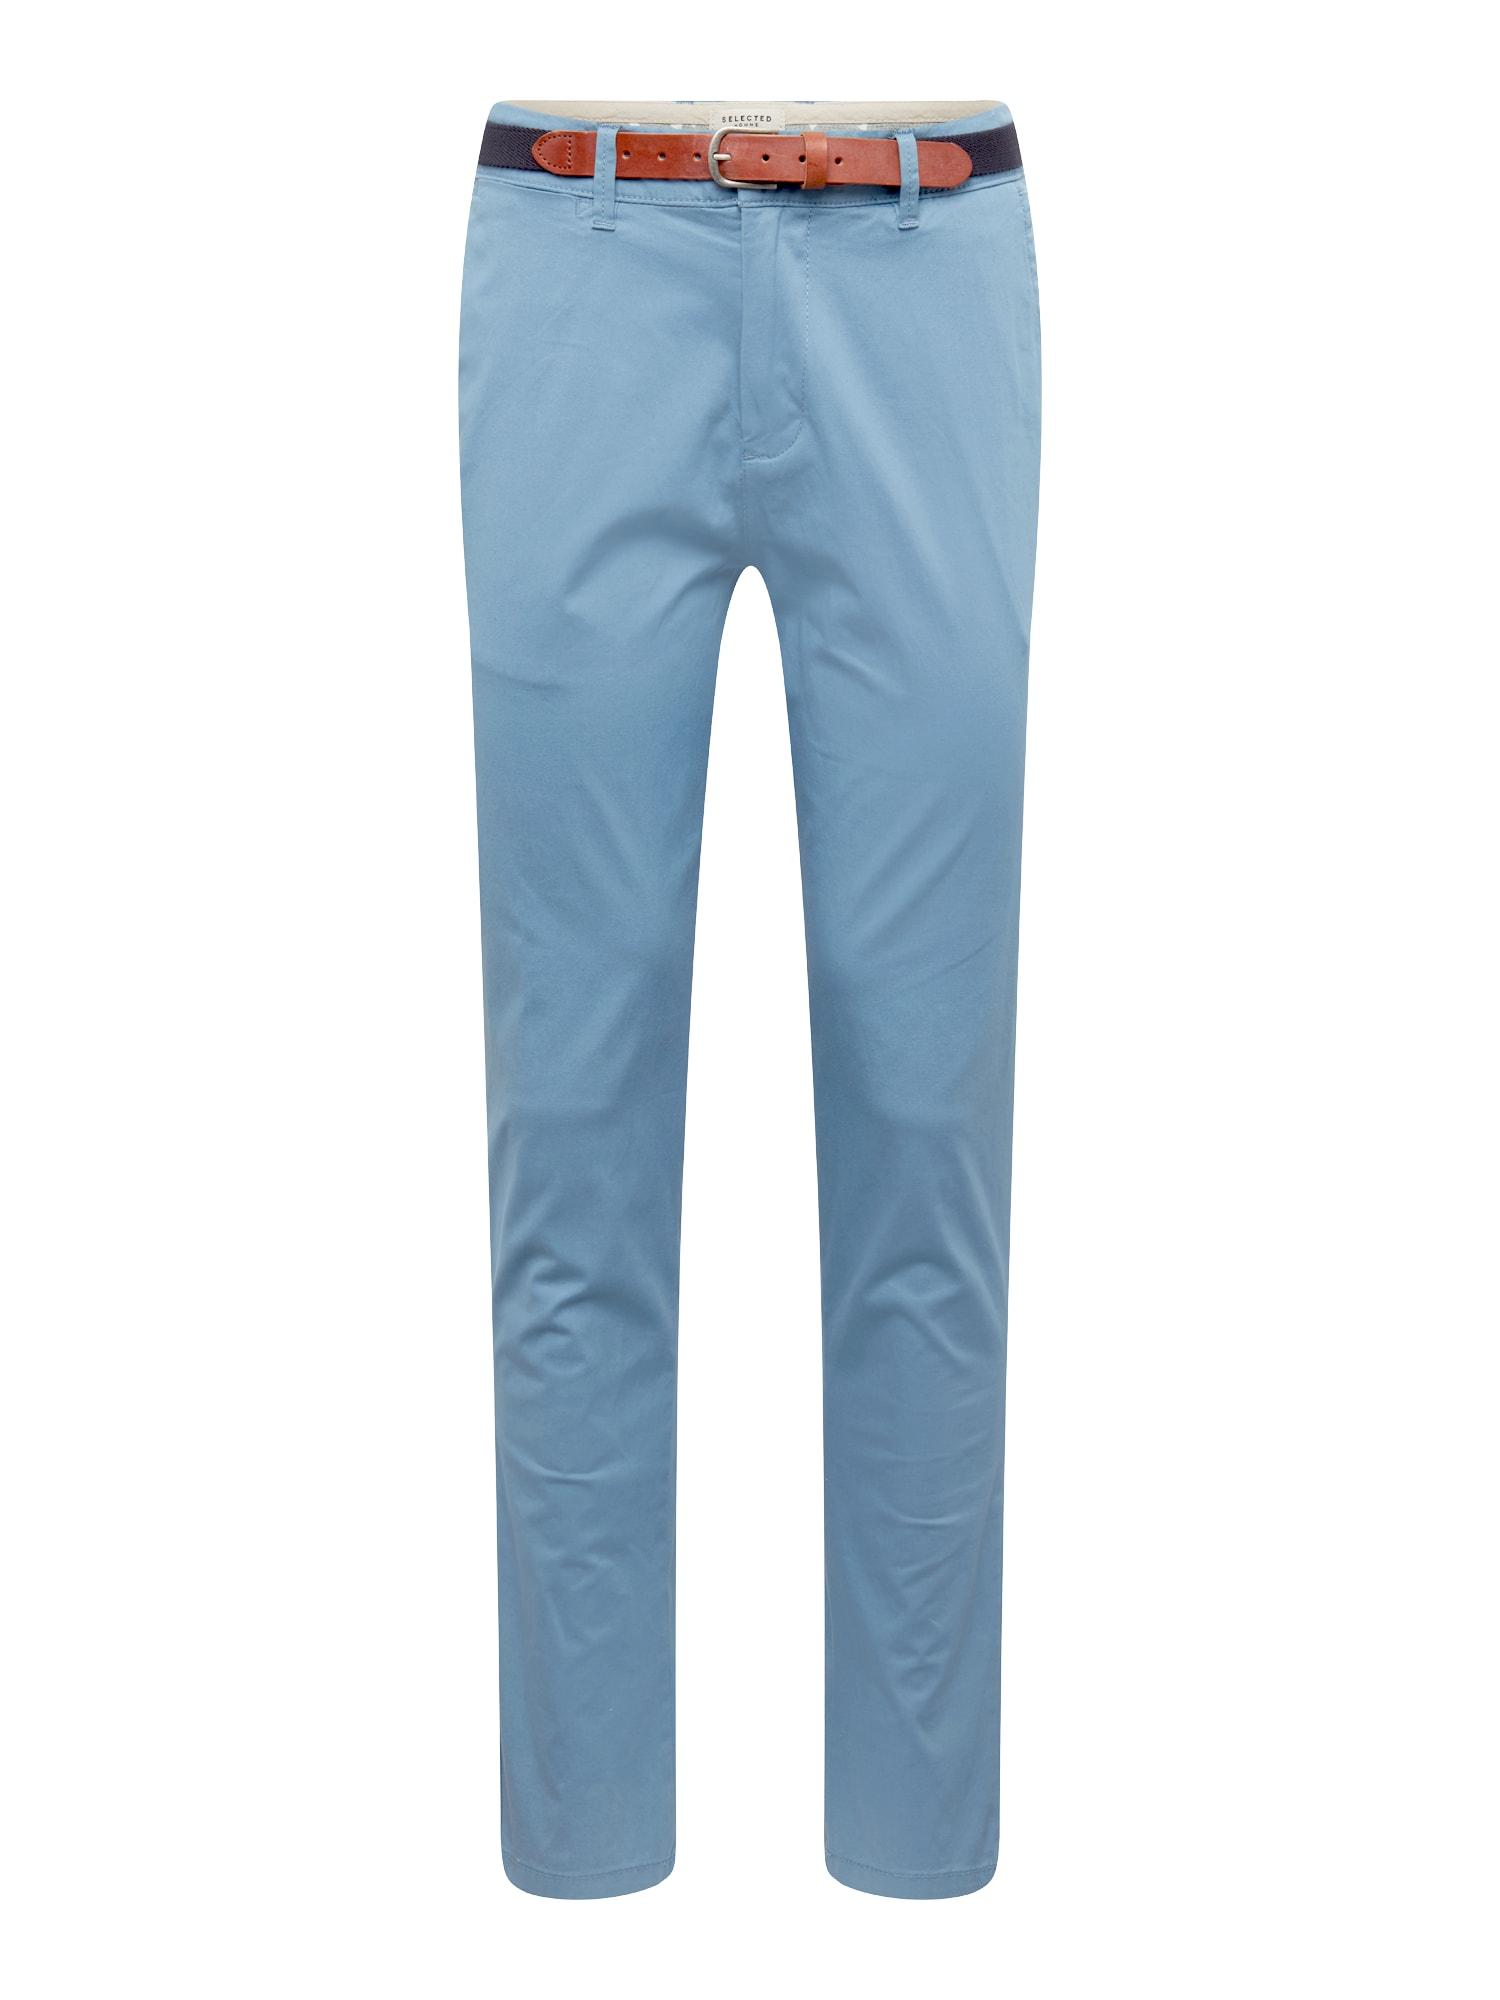 Chino kalhoty Blue Shadow kouřově modrá SELECTED HOMME